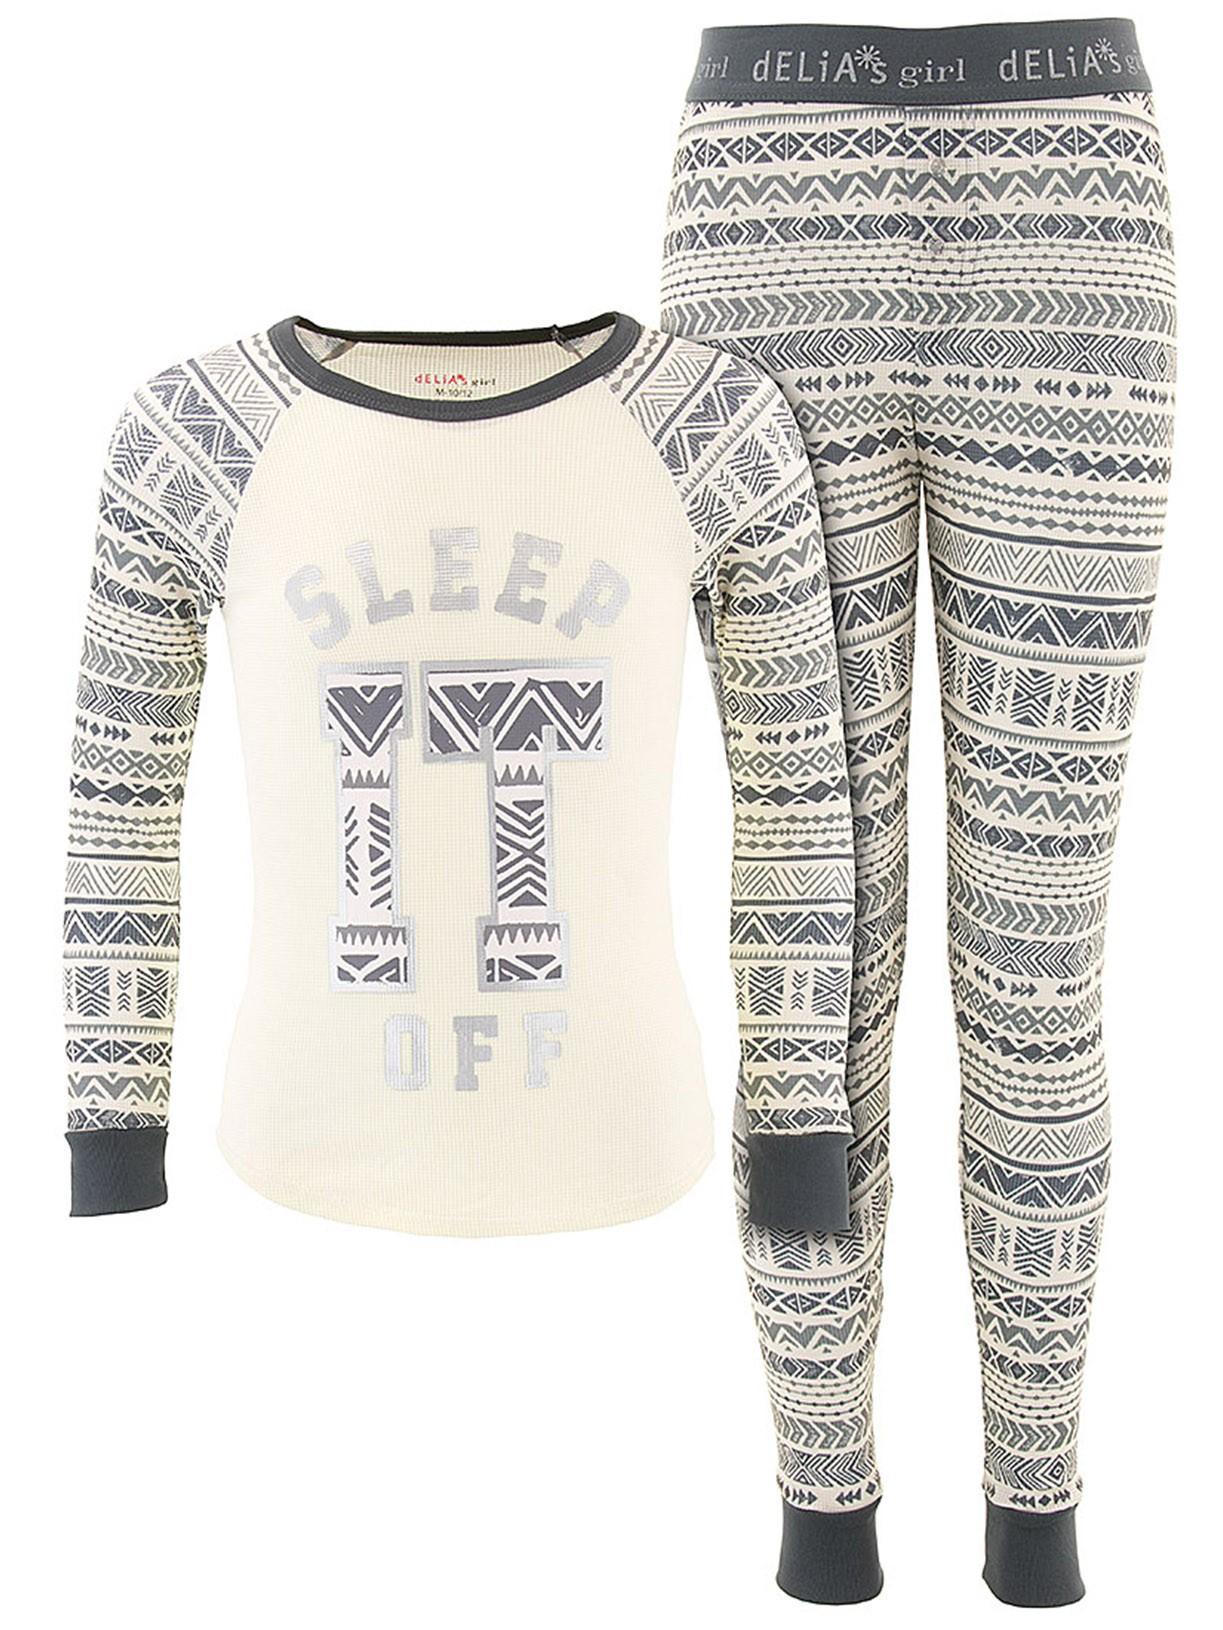 Delia*s Girls Sleep It Off Gray Thermal Pajamas